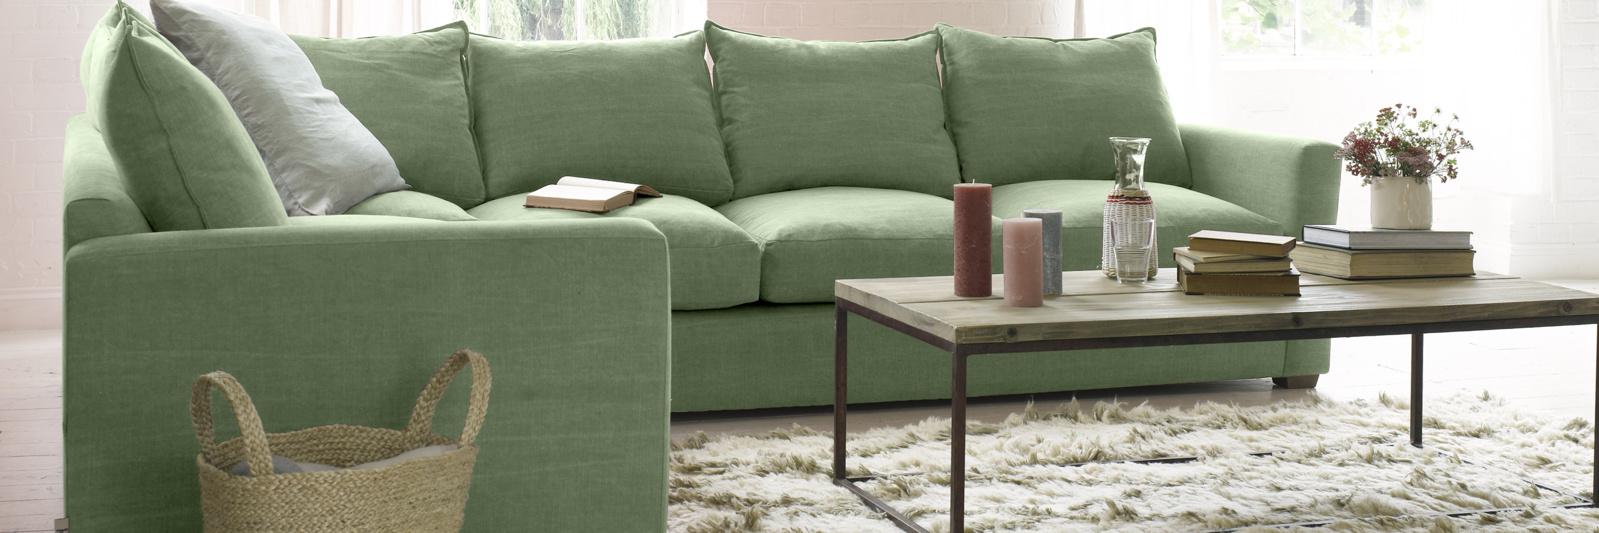 British made contemporary corner chaise sofa